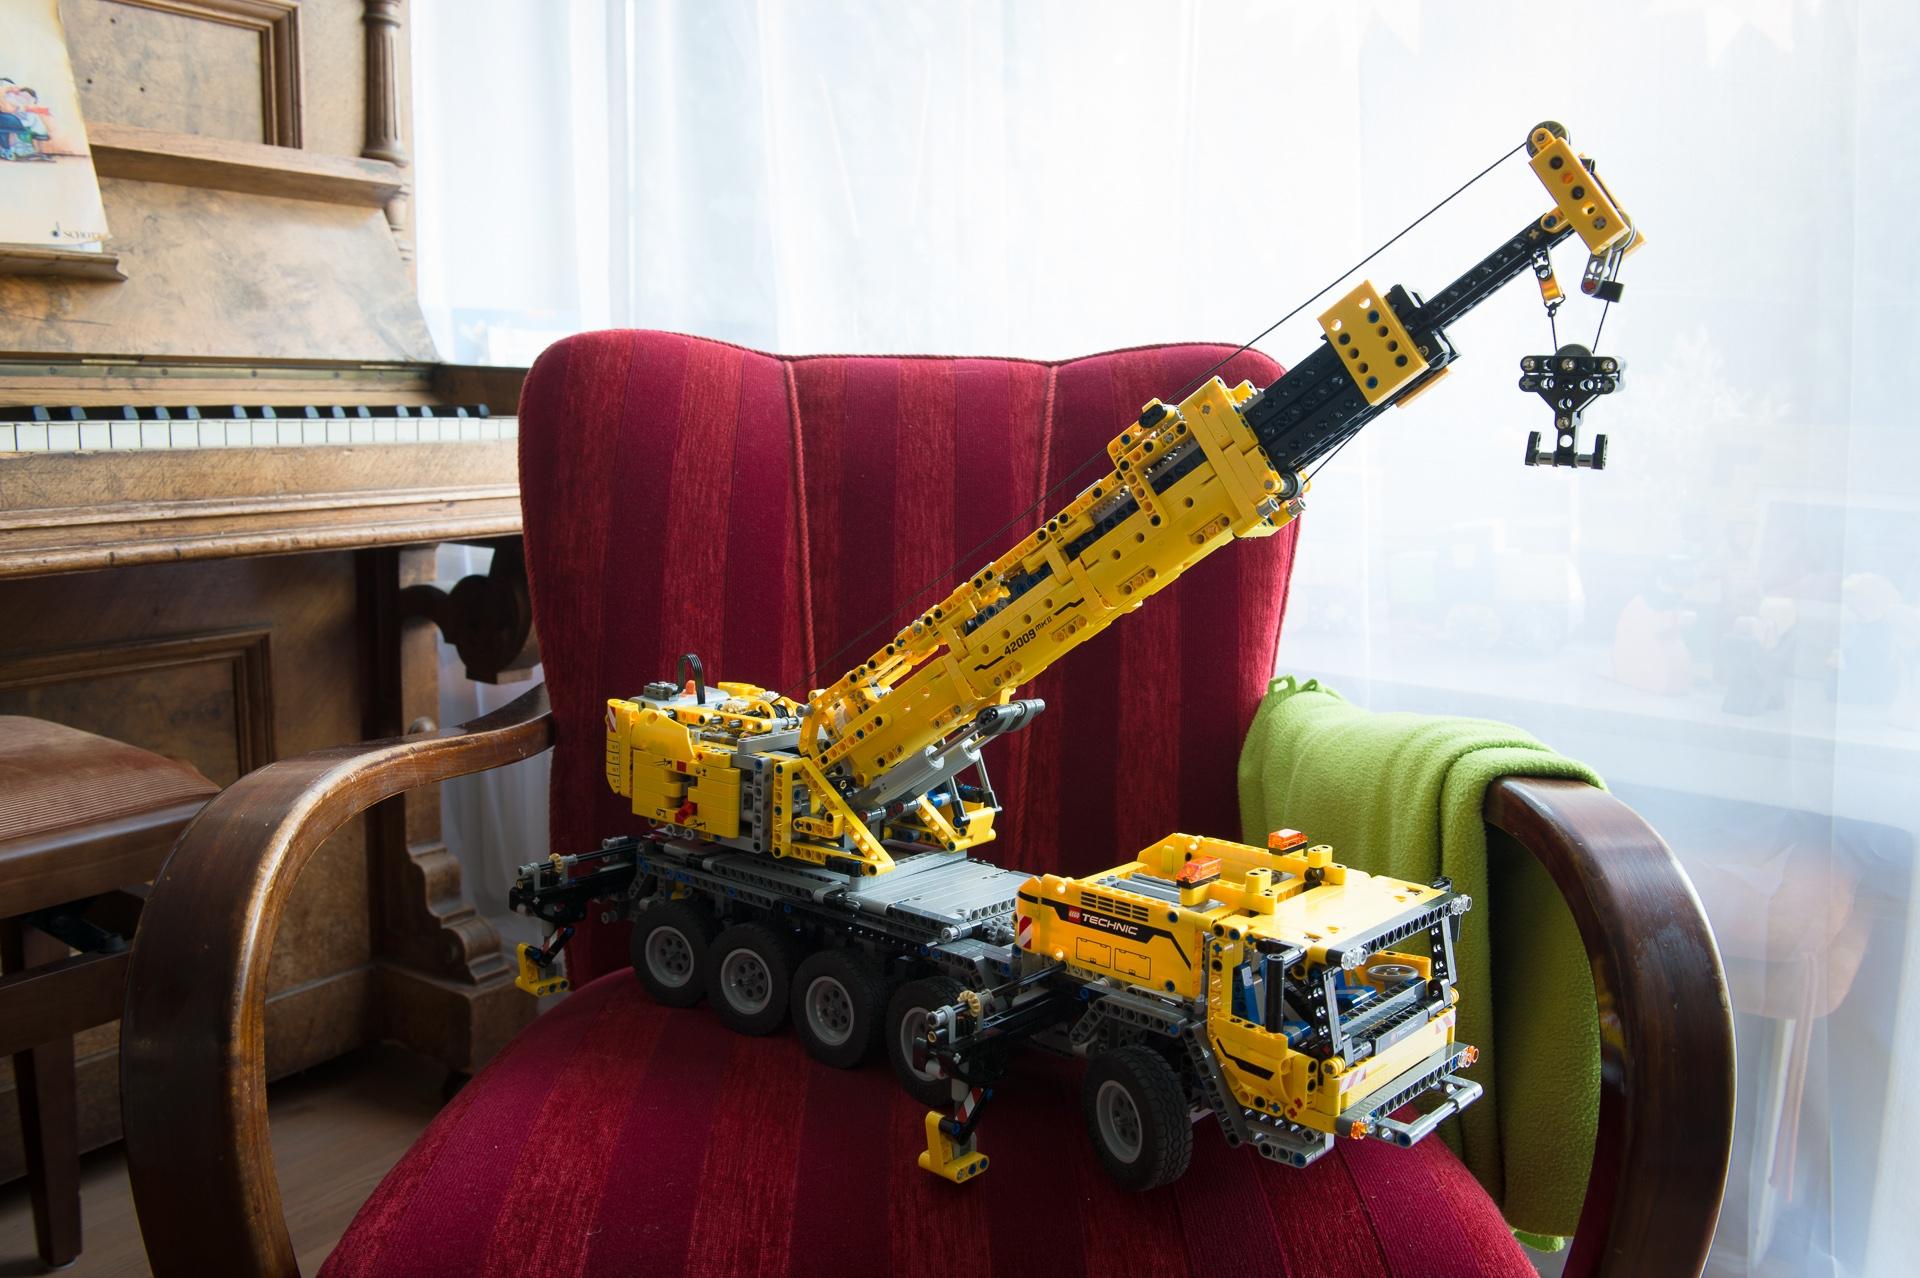 lego-technic-42009-mobiler-schwerlastkran-zusammengebaut-01